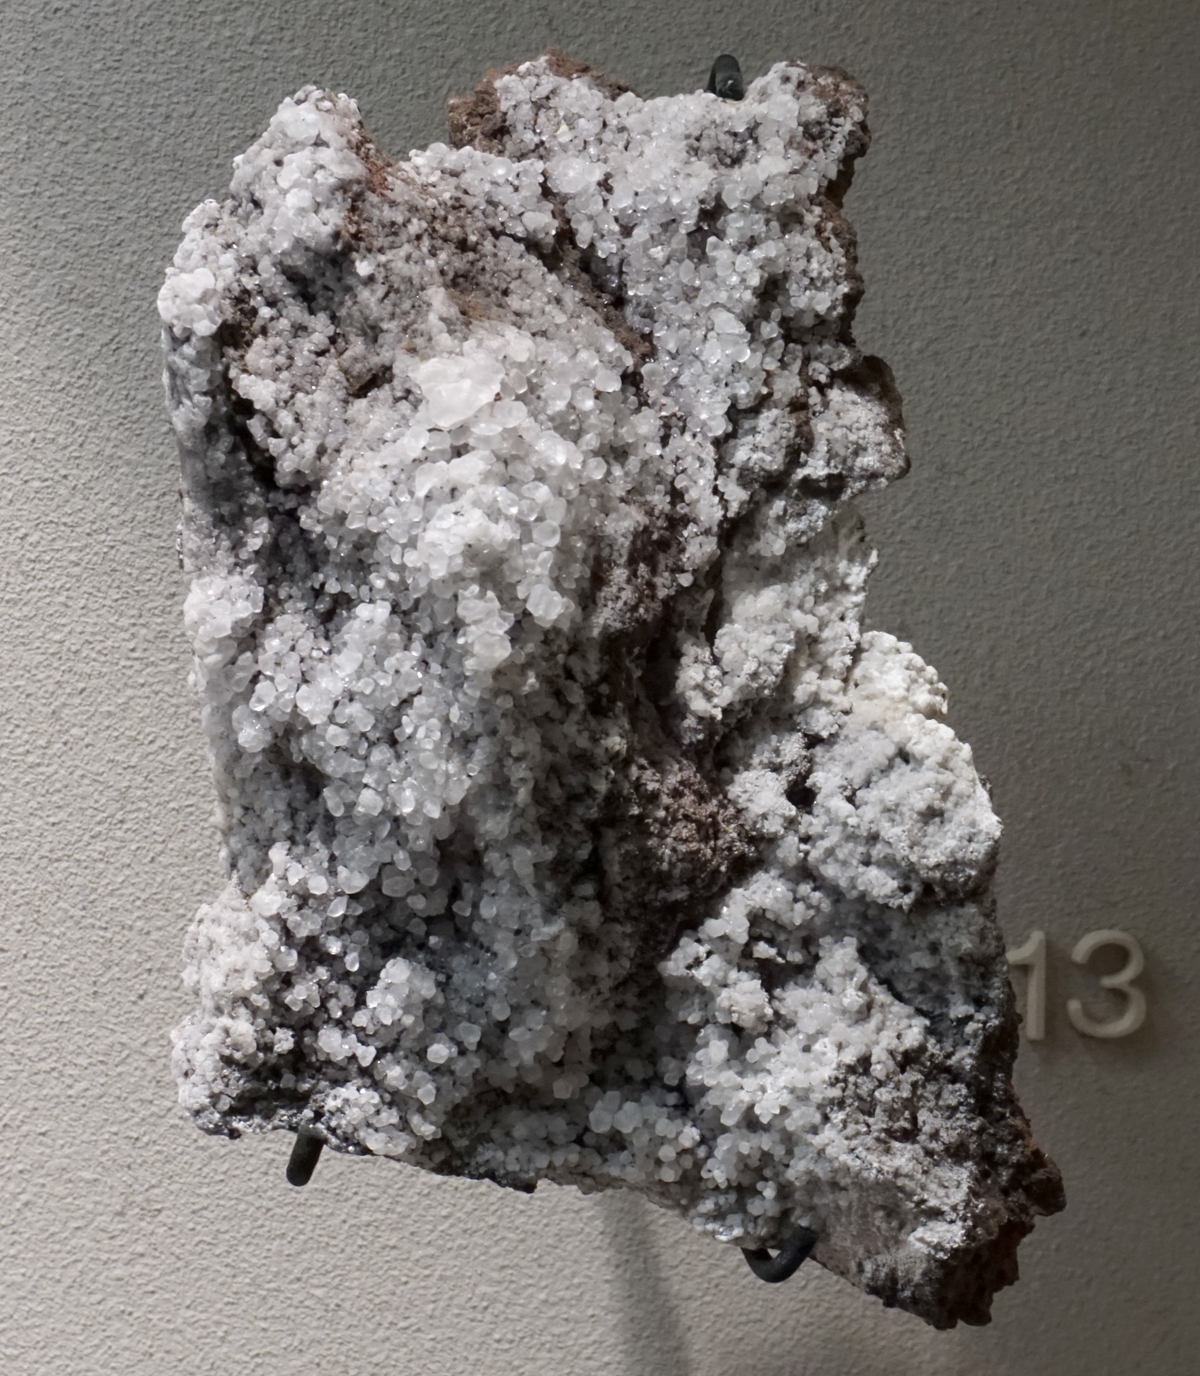 Colorless Sal Ammoniac Crystals